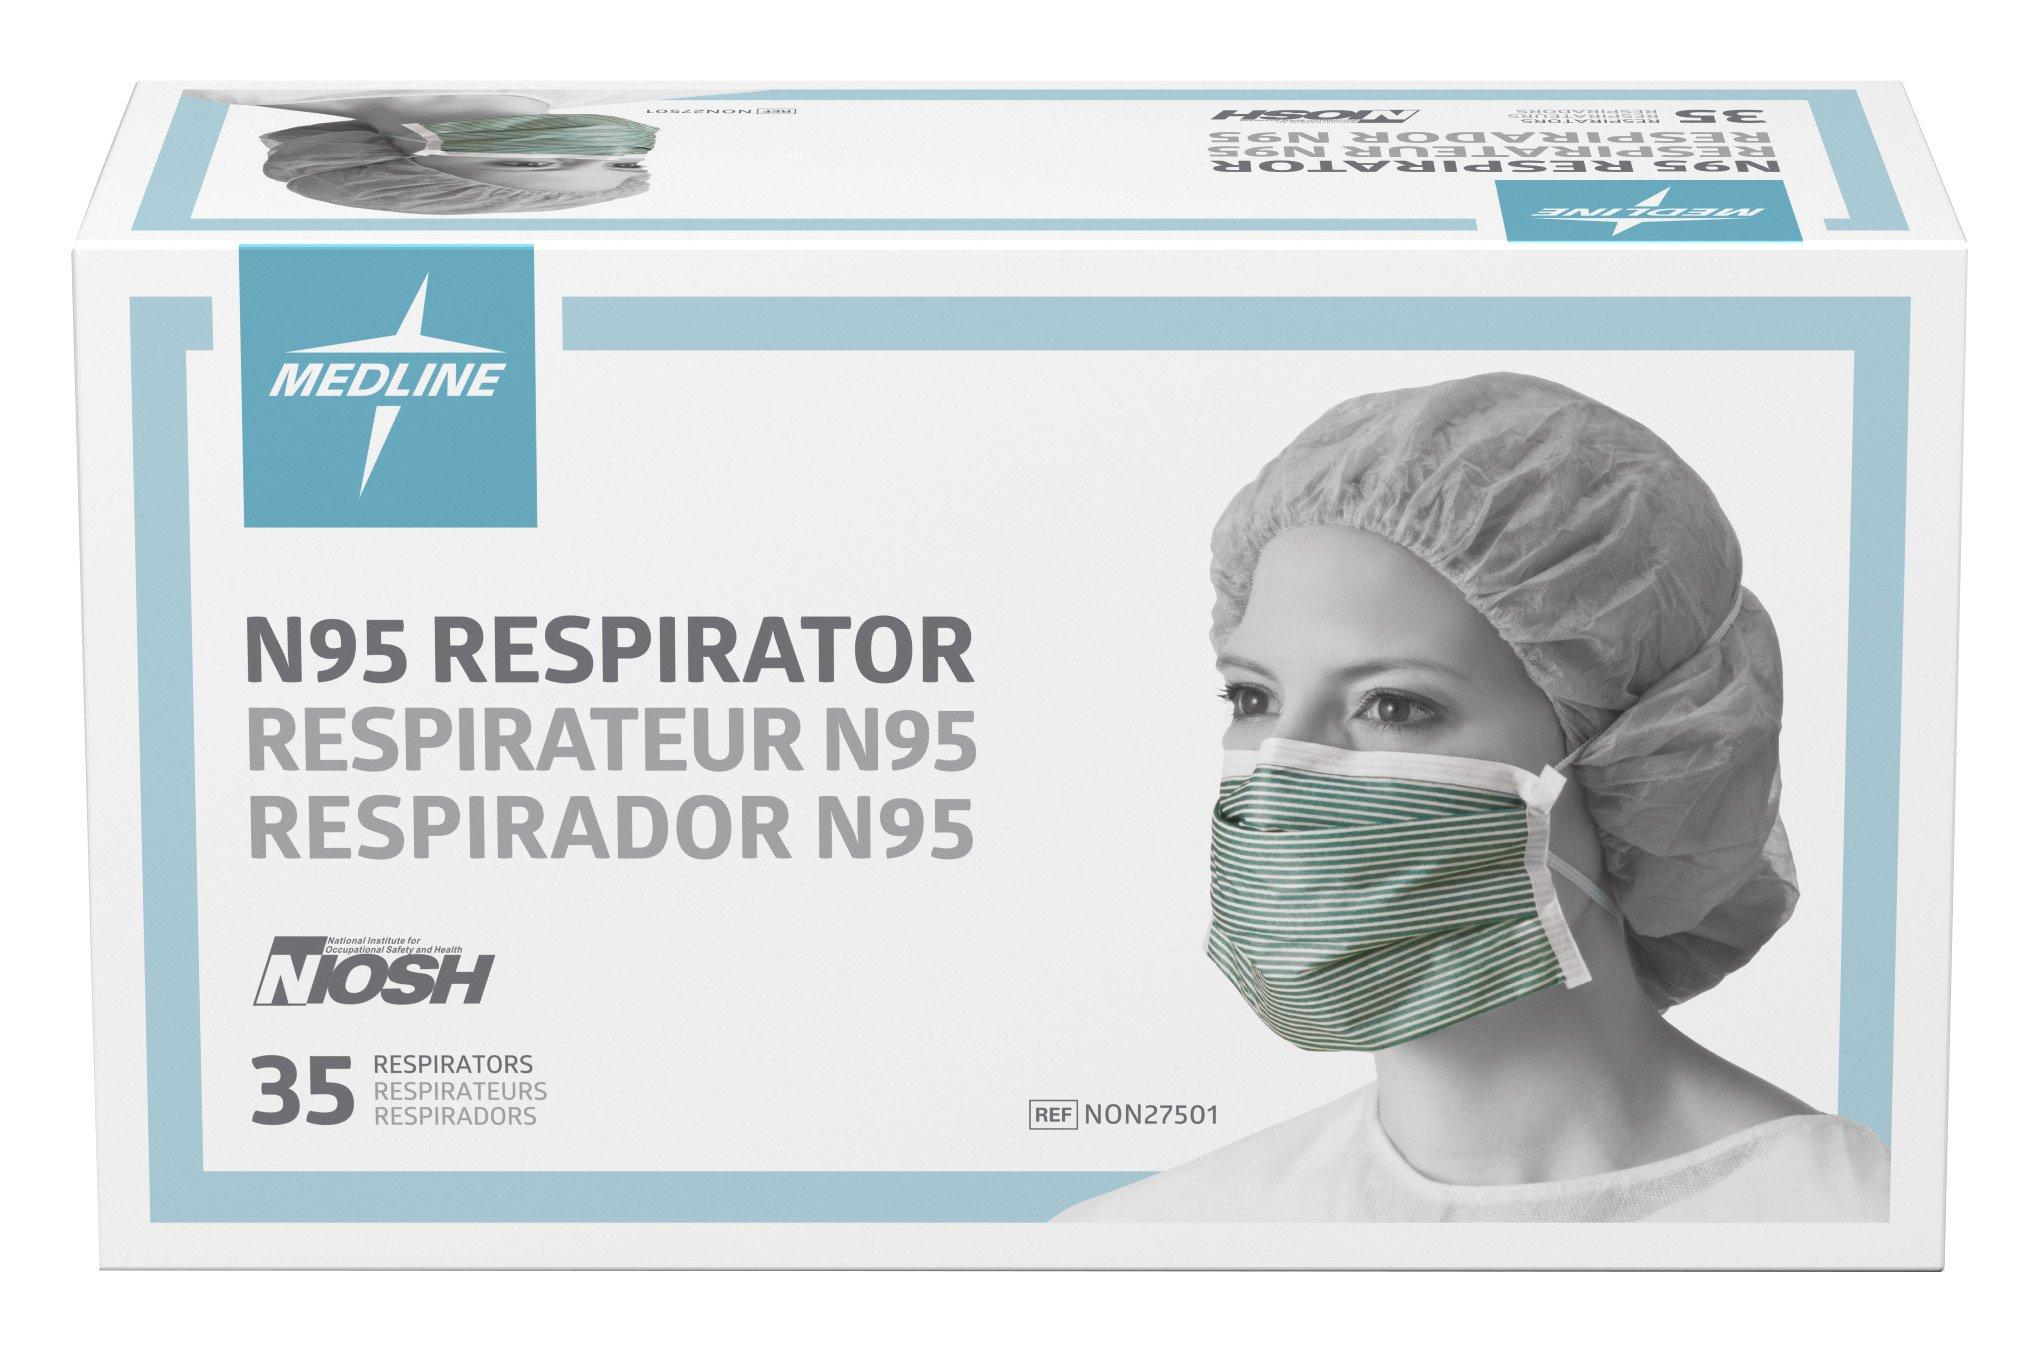 Medline NON27501 N95 Flat Fold Respirator Masks, Cellulose, Latex Free, White/Green (Pack of 210) by Medline (Image #3)